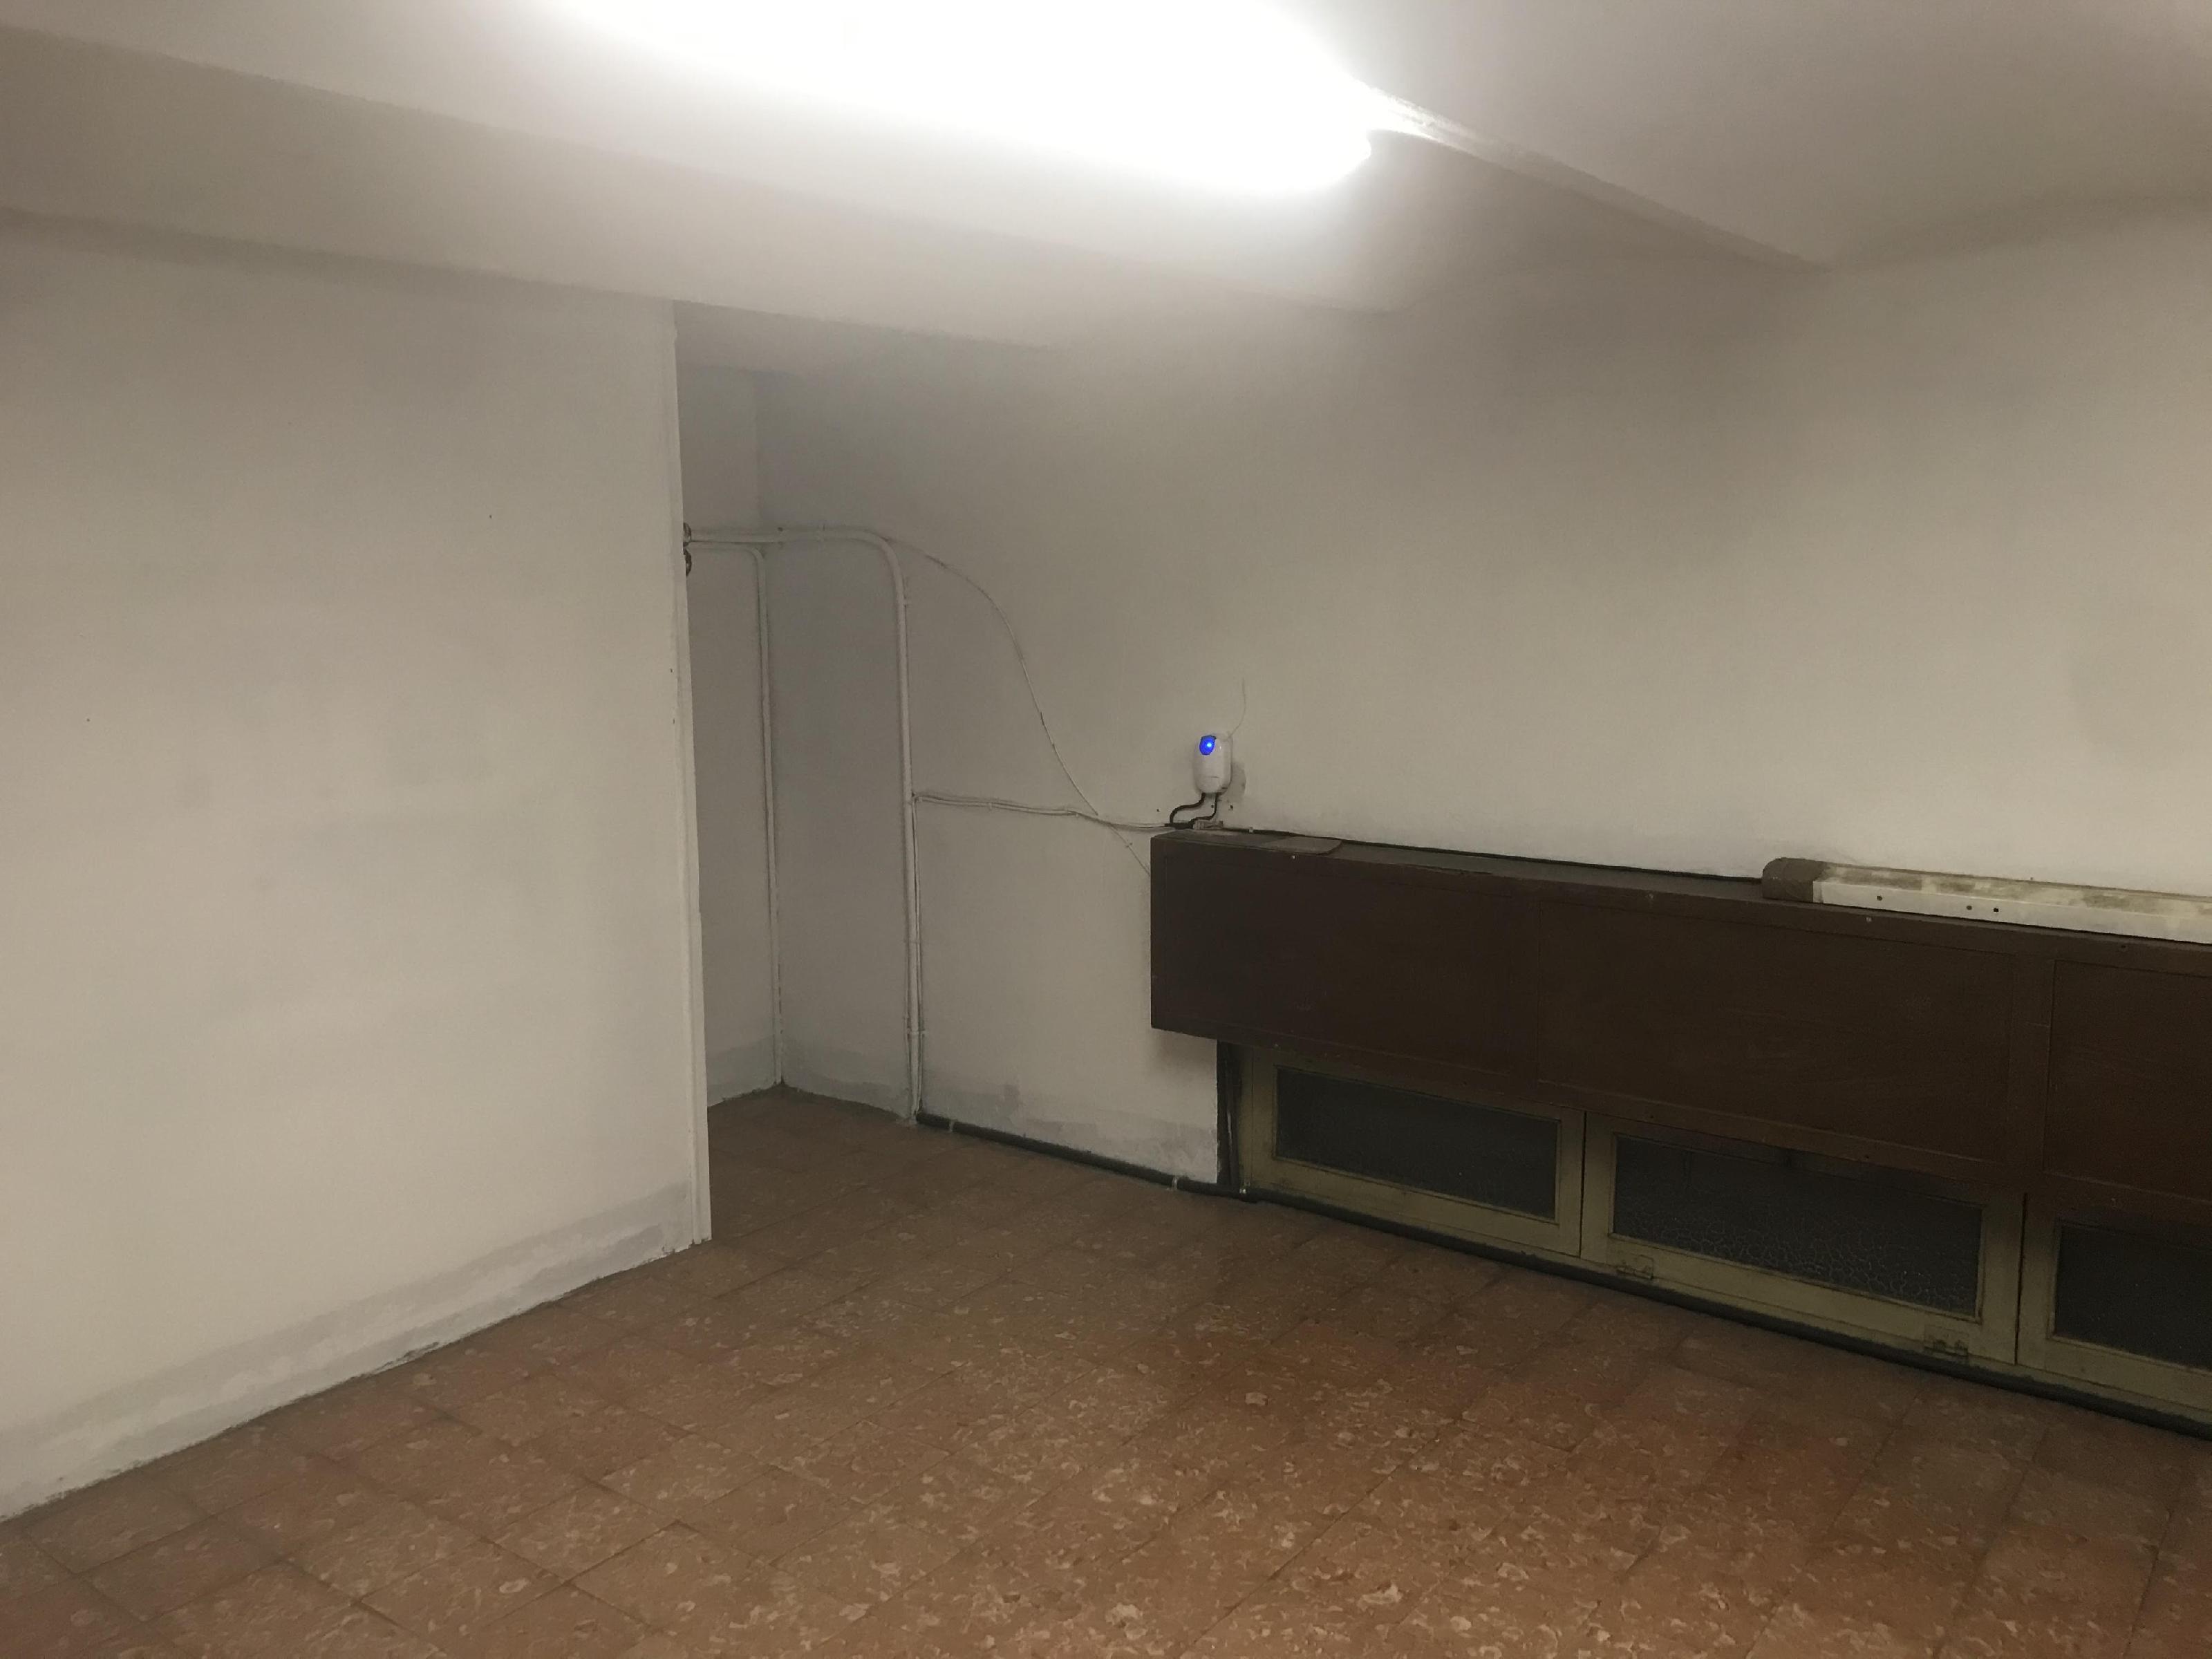 249614 Commercial premises for sale in Sarrià-Sant Gervasi, Sant Gervasi-Galvany 12